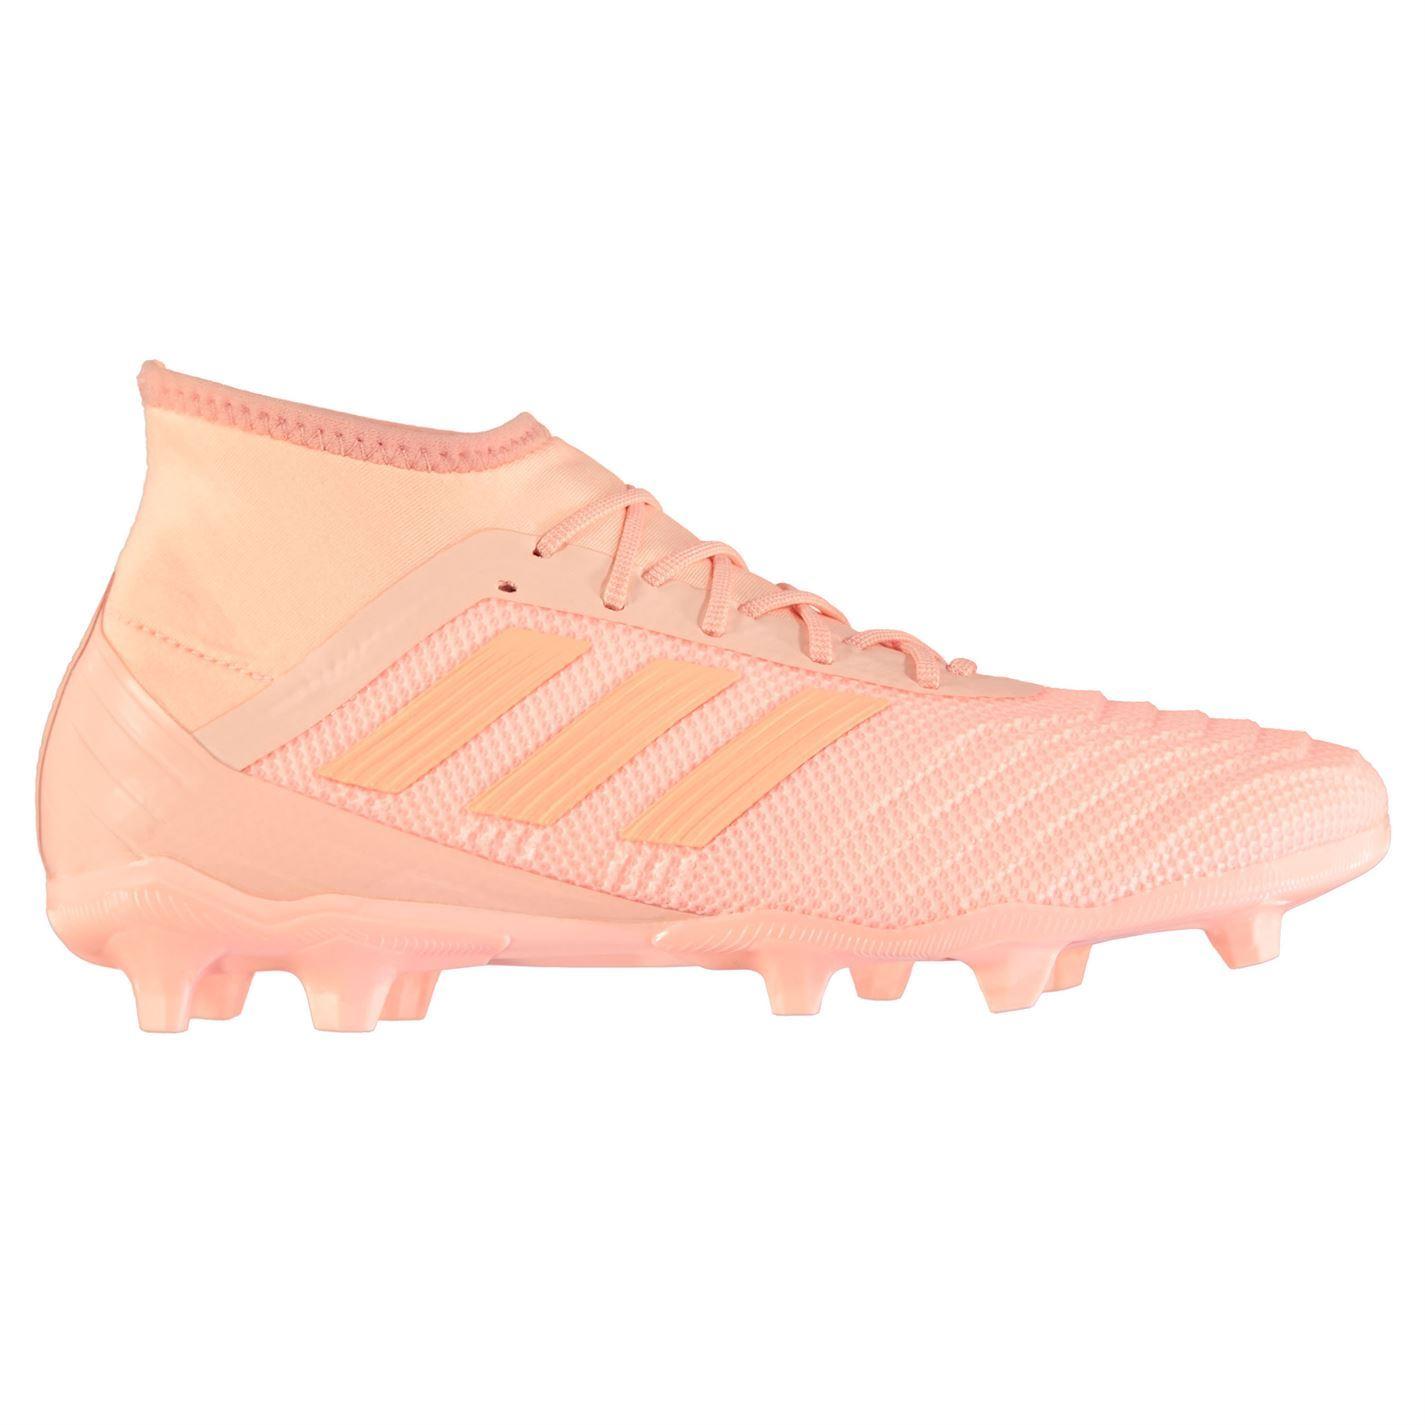 Adidas-Predator-18-2-FG-Firm-Ground-Chaussures-De-Football-Homme-Football-Chaussures-Crampons miniature 11